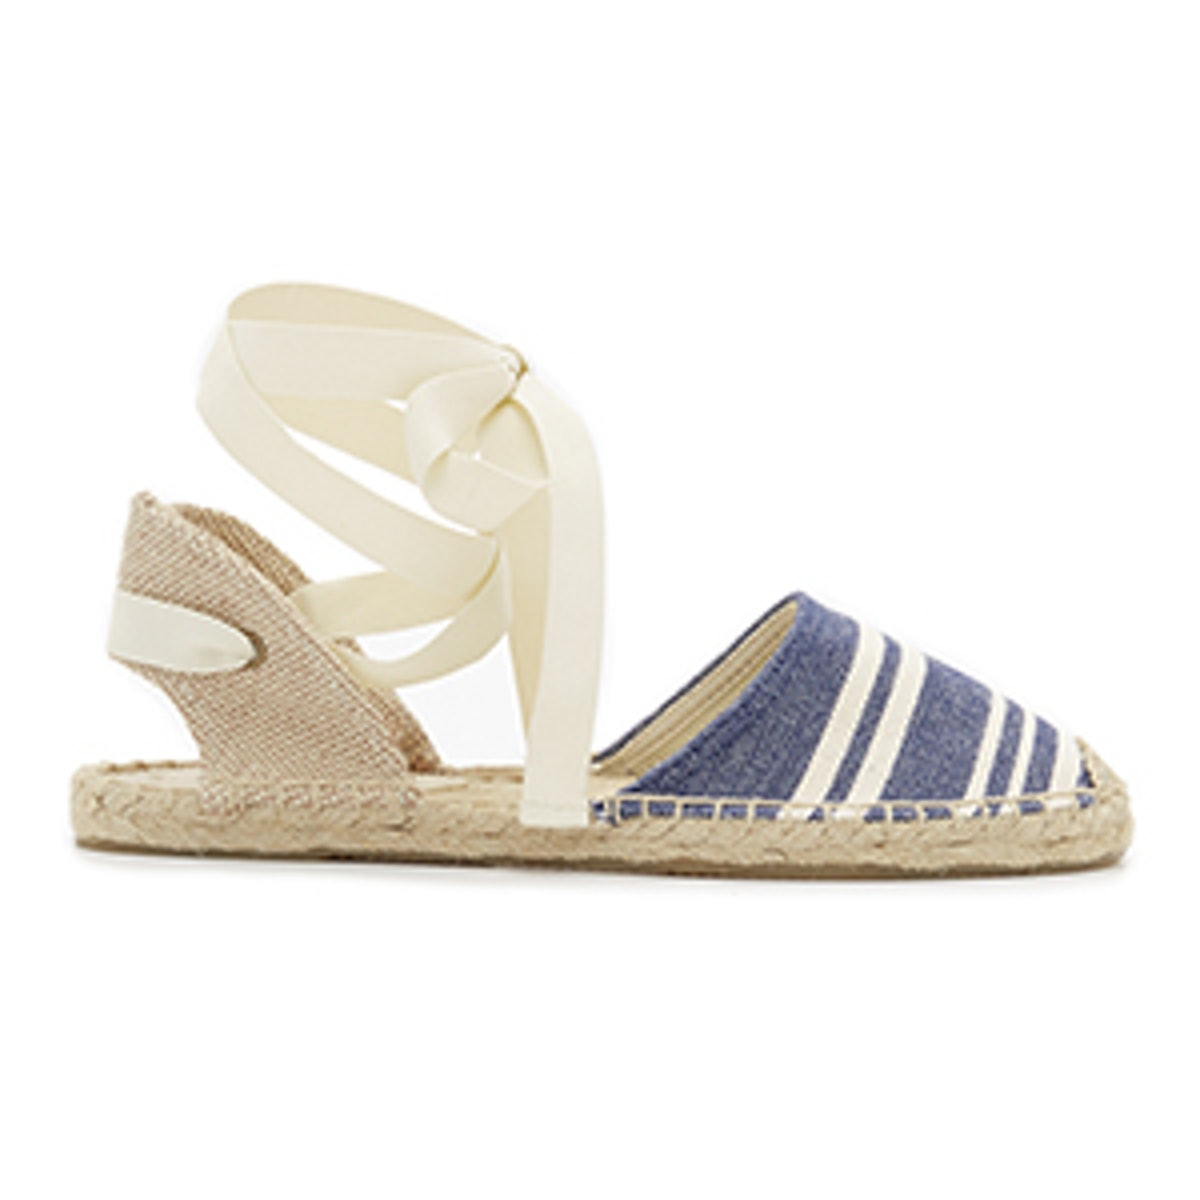 Candy Stripe Sandals